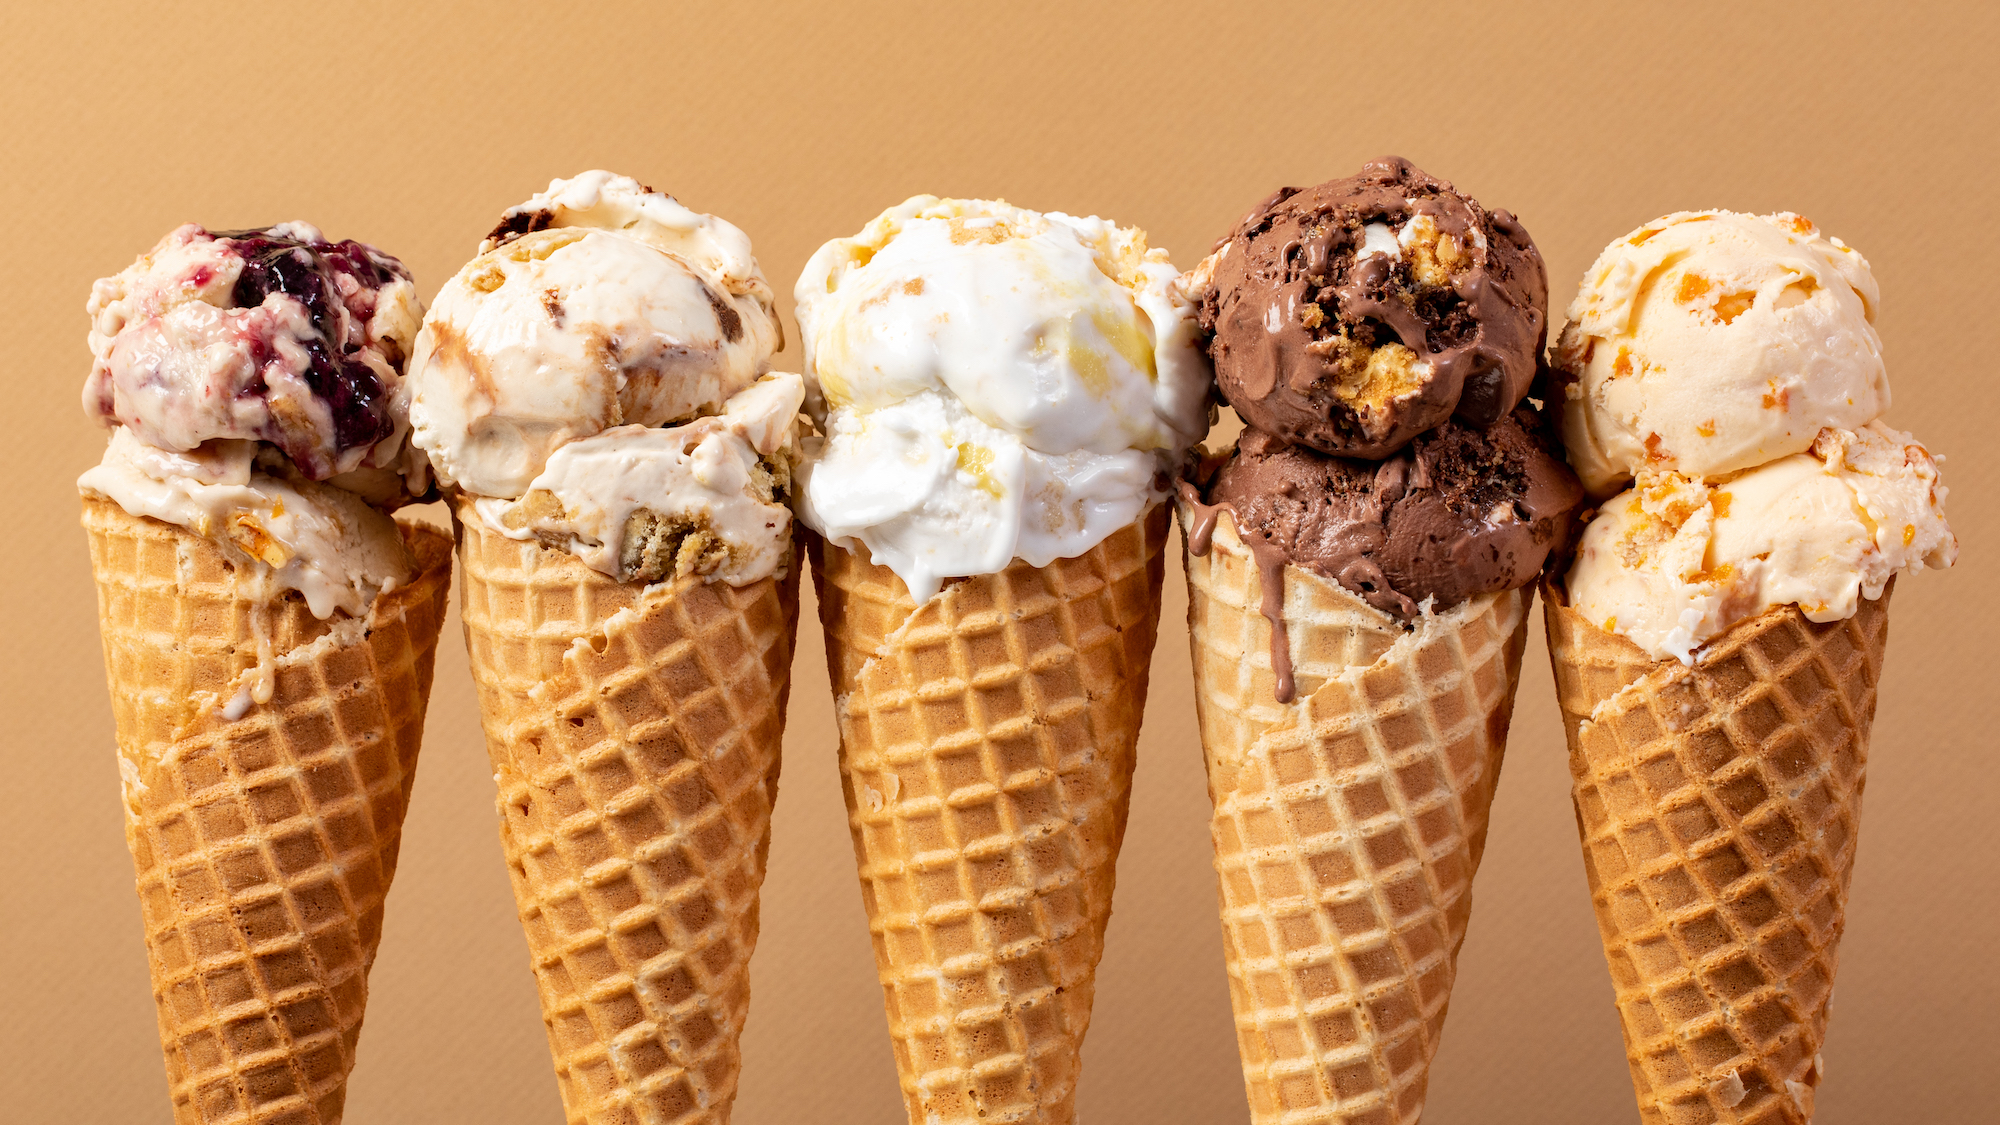 Ice Cream Hit Salt & Straw Sets Sights on a Busy Pasadena Stretch Next